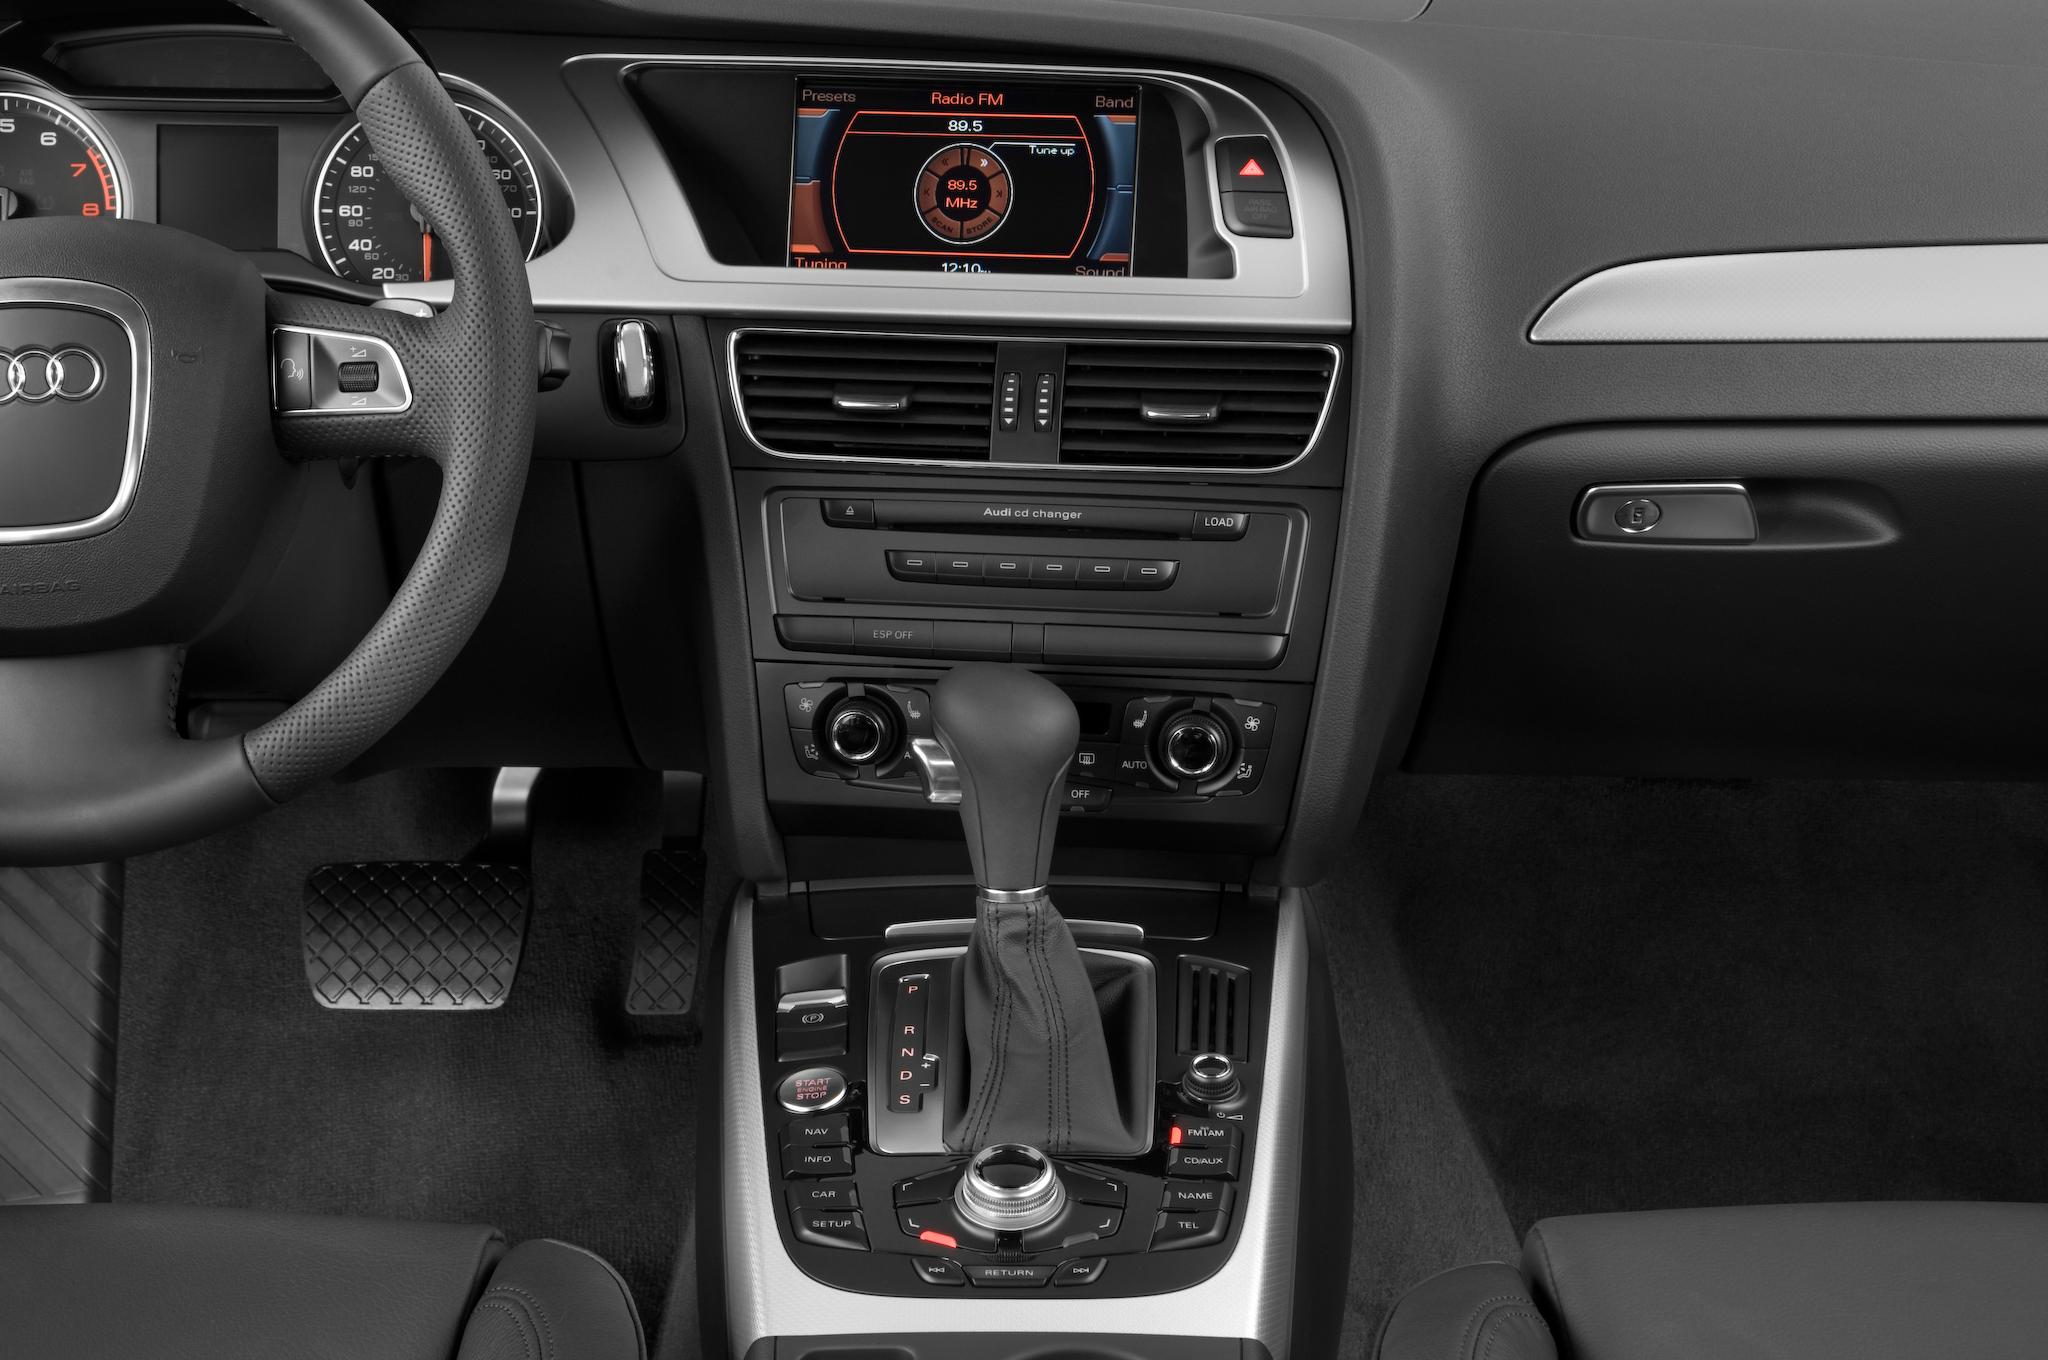 2010 audi a4 2 0t m t audi luxury sedan review automobile magazine rh automobilemag com audi a4 2010 user manual pdf audi a4 2010 user manual pdf